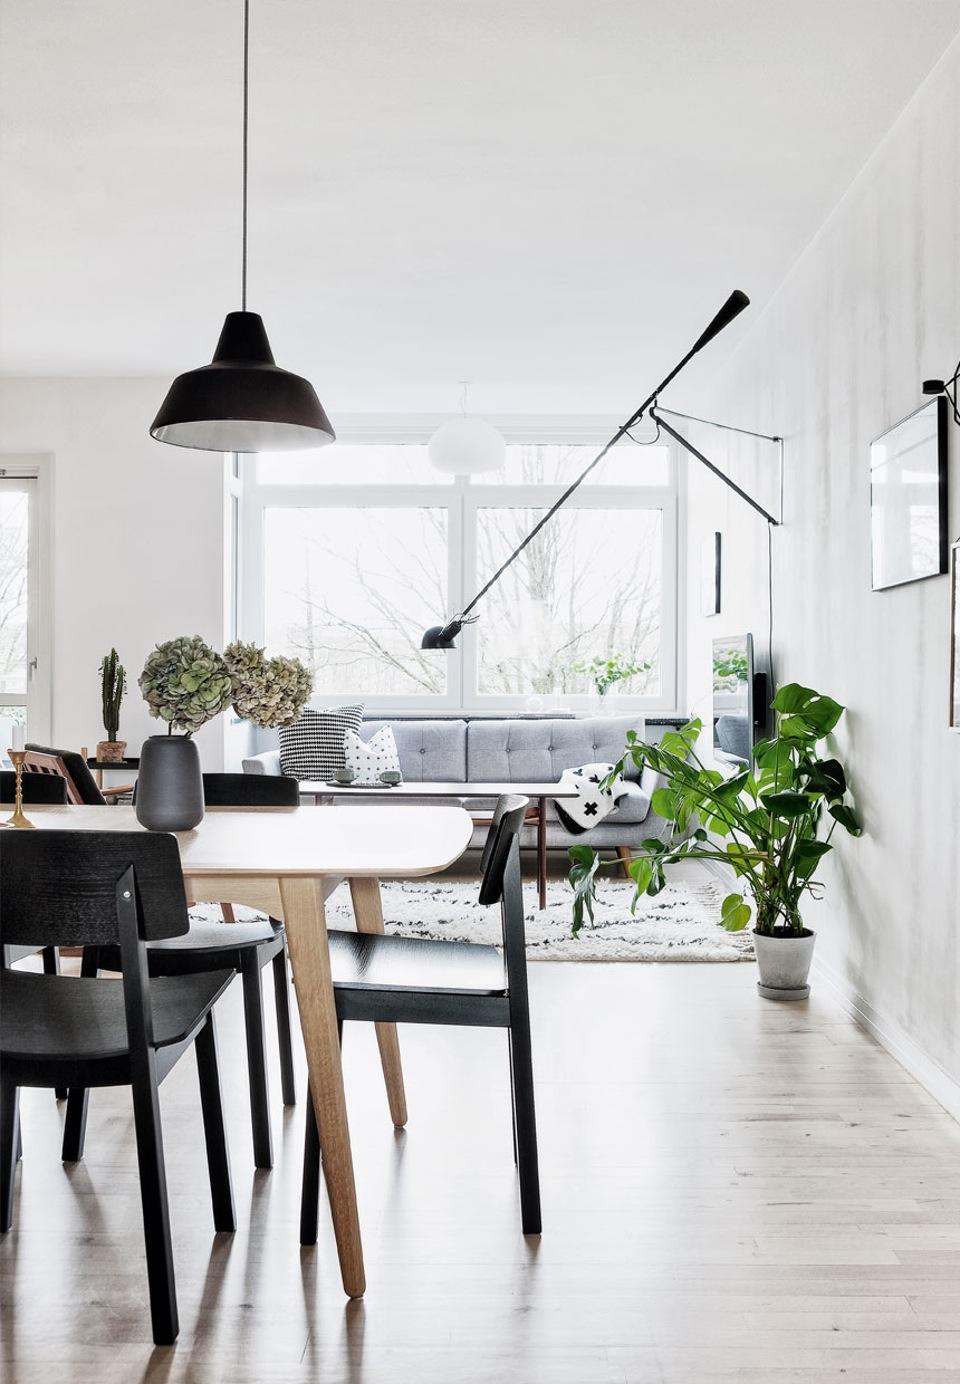 stue-nordisk-johanne-nygaard-dueholm-lejlighed-aalborg-_xbf2mf8plwmmlfg8yk9nw